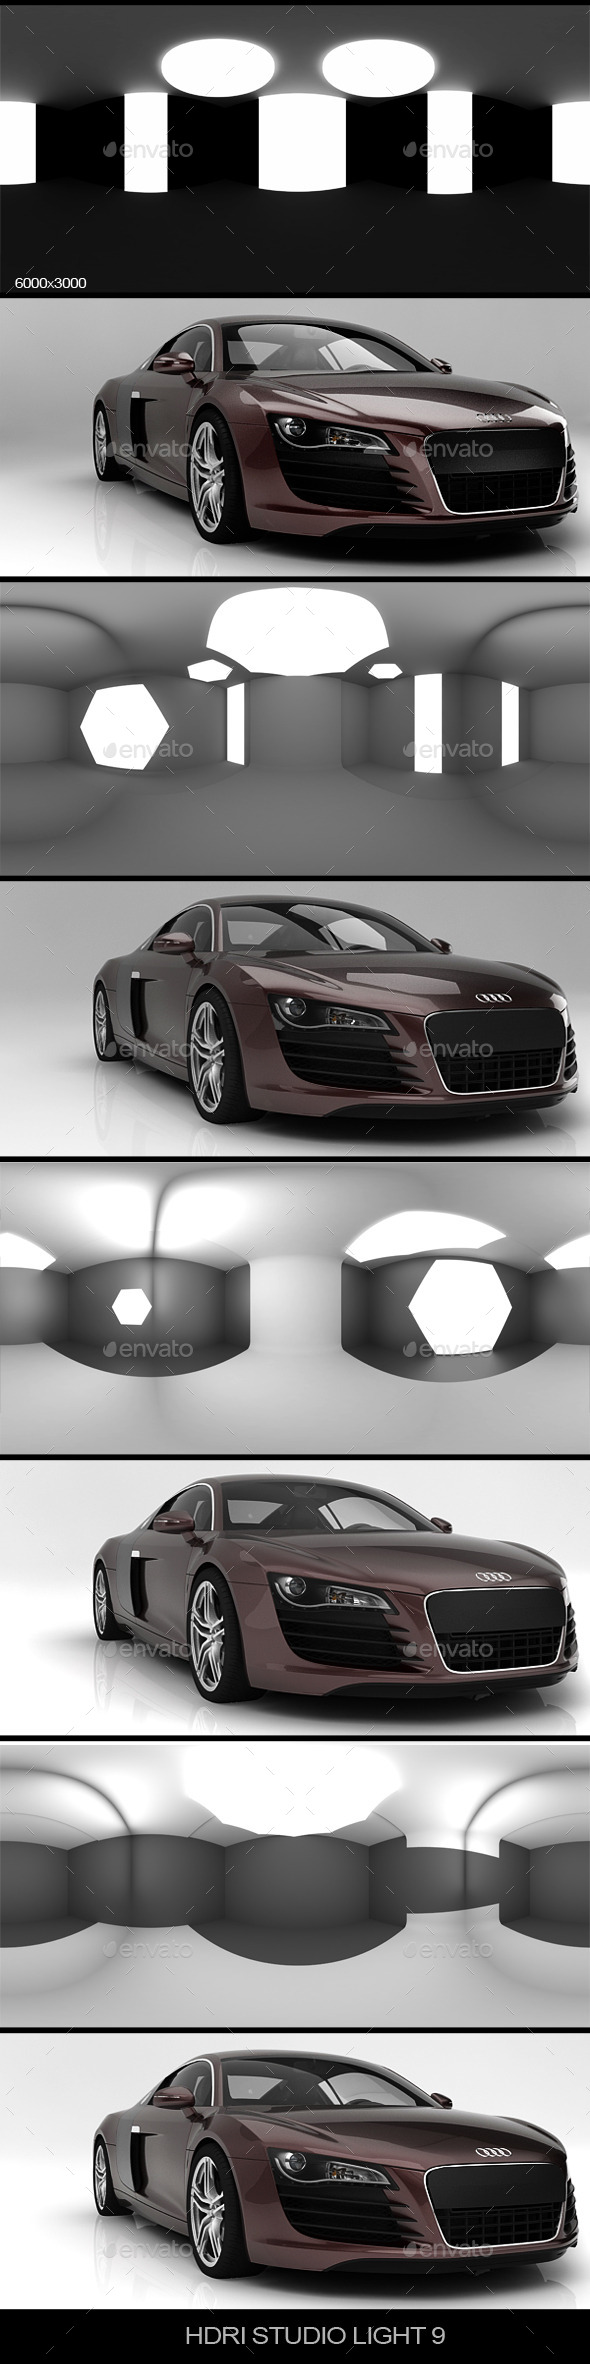 Studio light 9  - 3DOcean Item for Sale